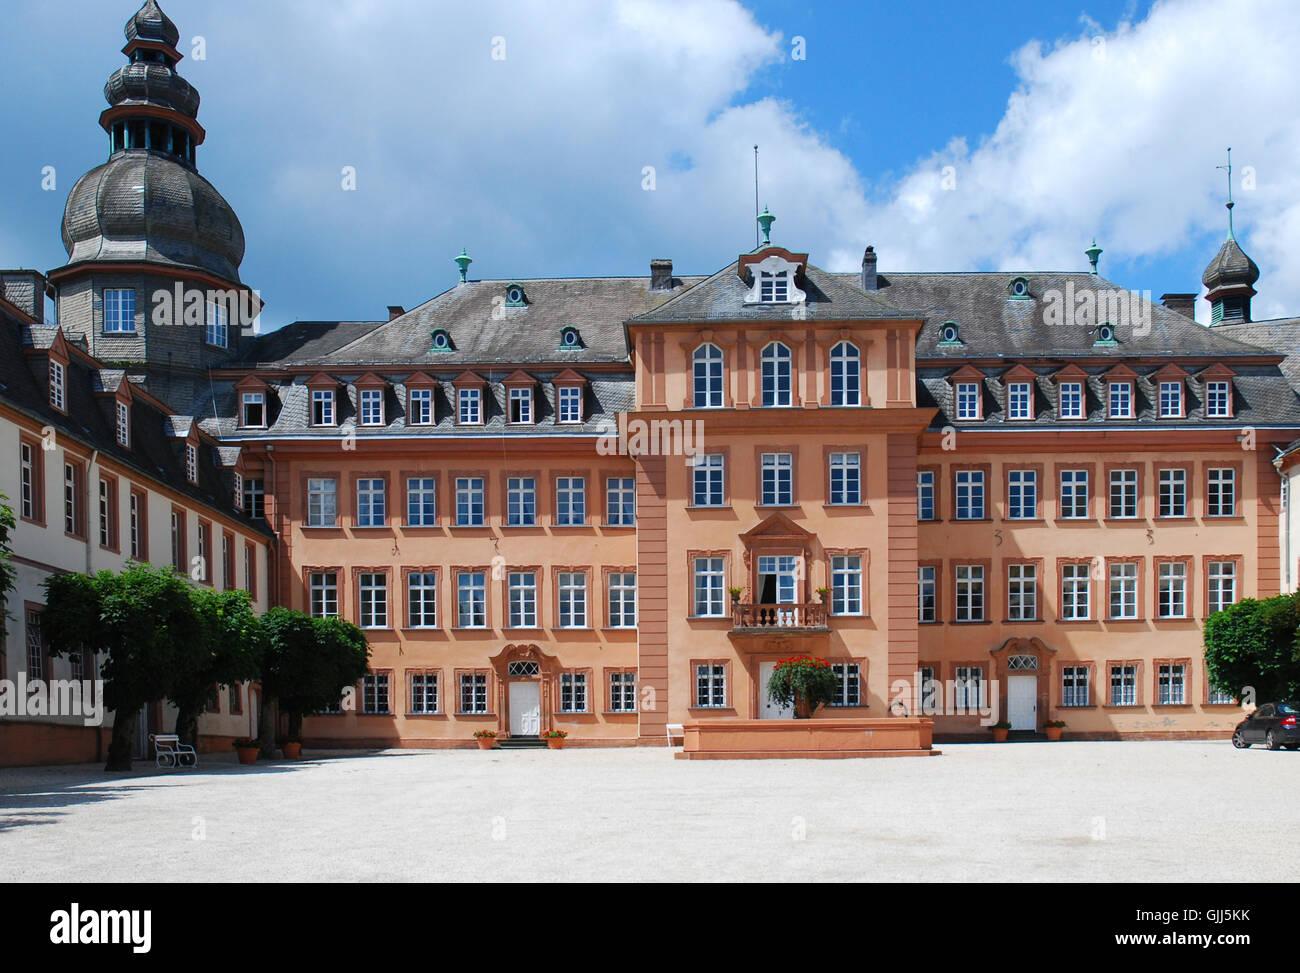 Schloss Wittgenstein Fotos & Schloss Wittgenstein Imagens de Stock ...